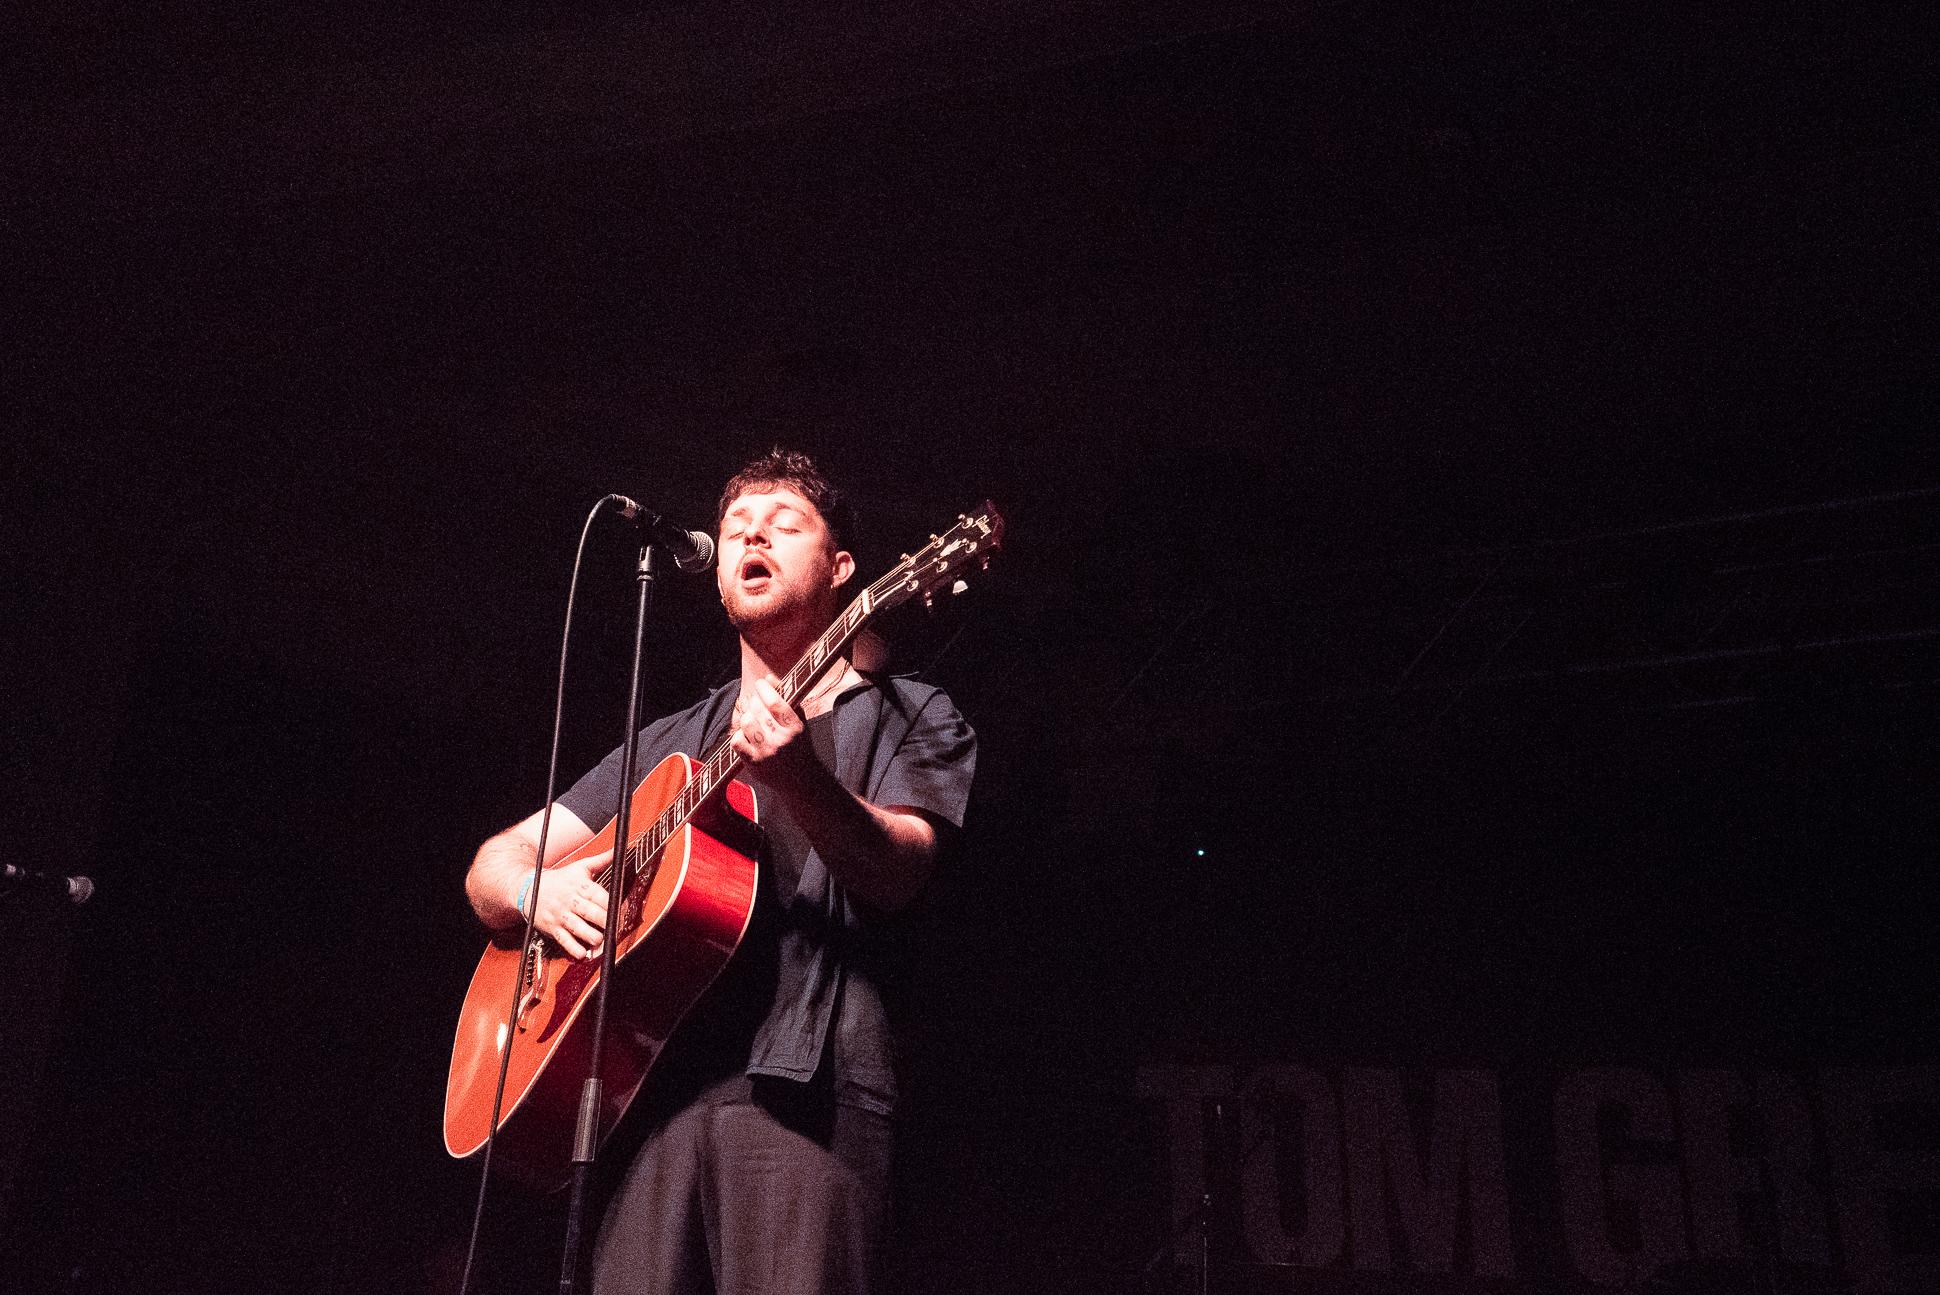 Live At Leeds 2019 - Tom Grennan_-3.jpg